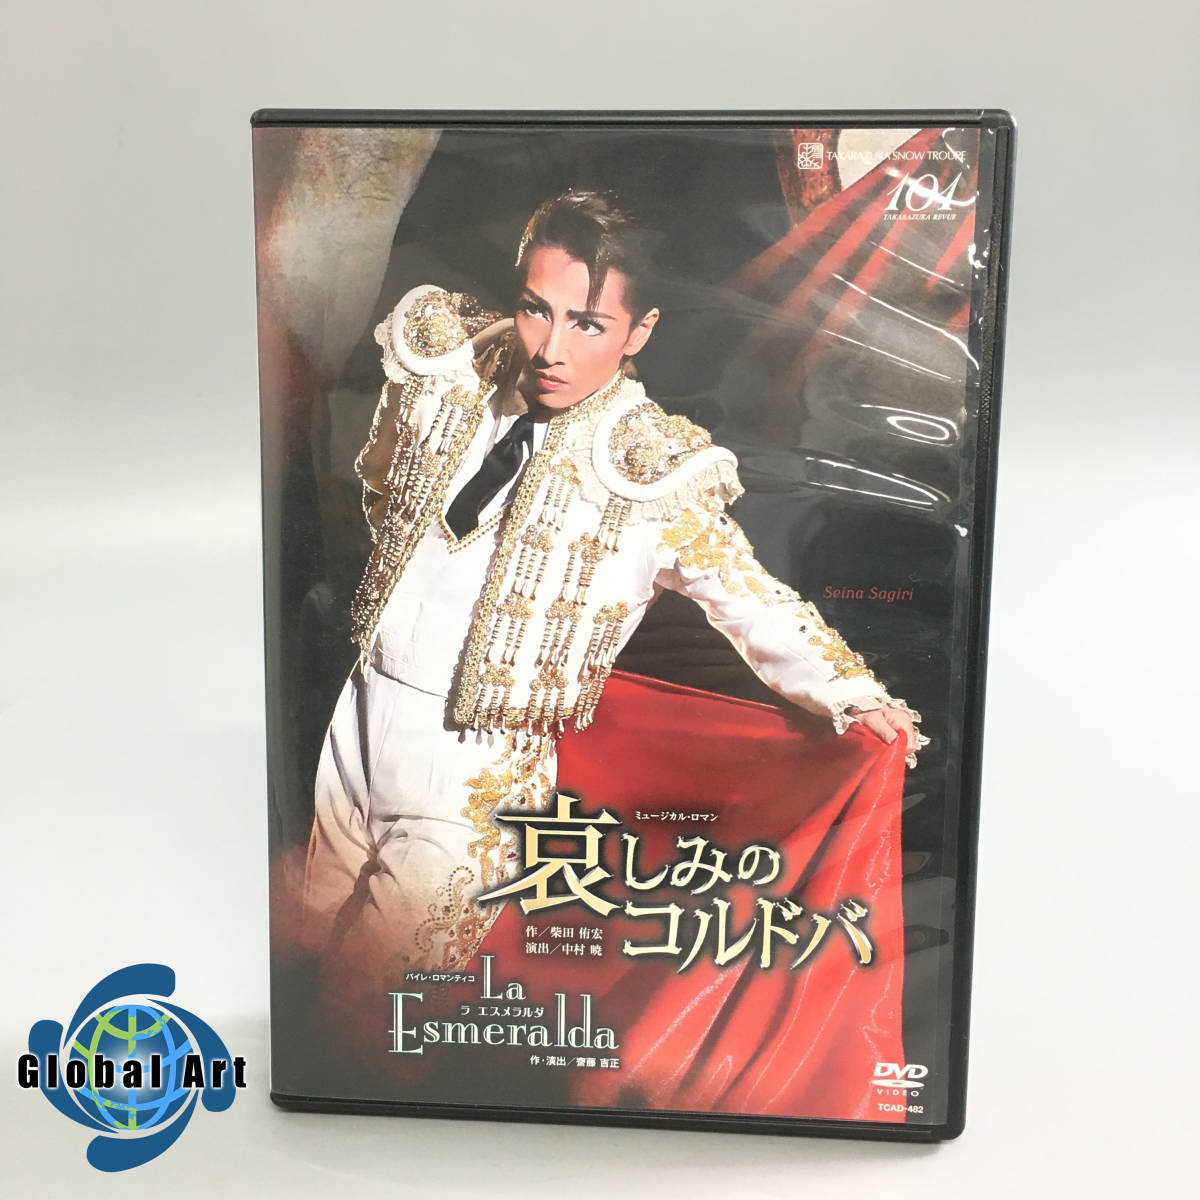 ★B04348【美品】宝塚歌劇/DVD/哀しみのコルドバ/La Esmeralda ラ エスメラルダ/雪組/全